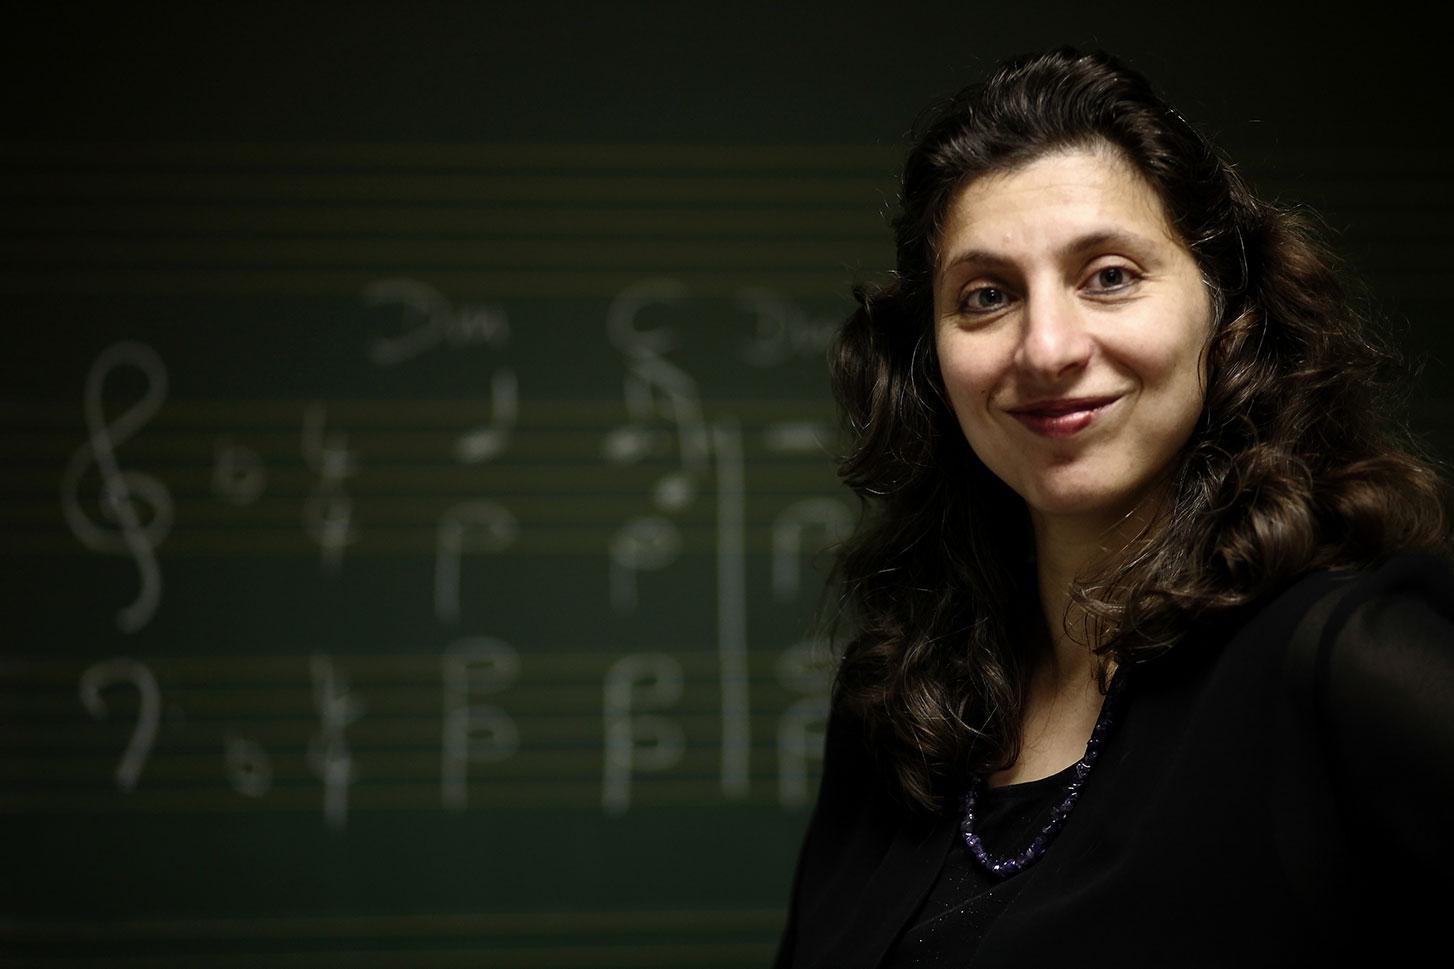 Eleonora Kazachkova